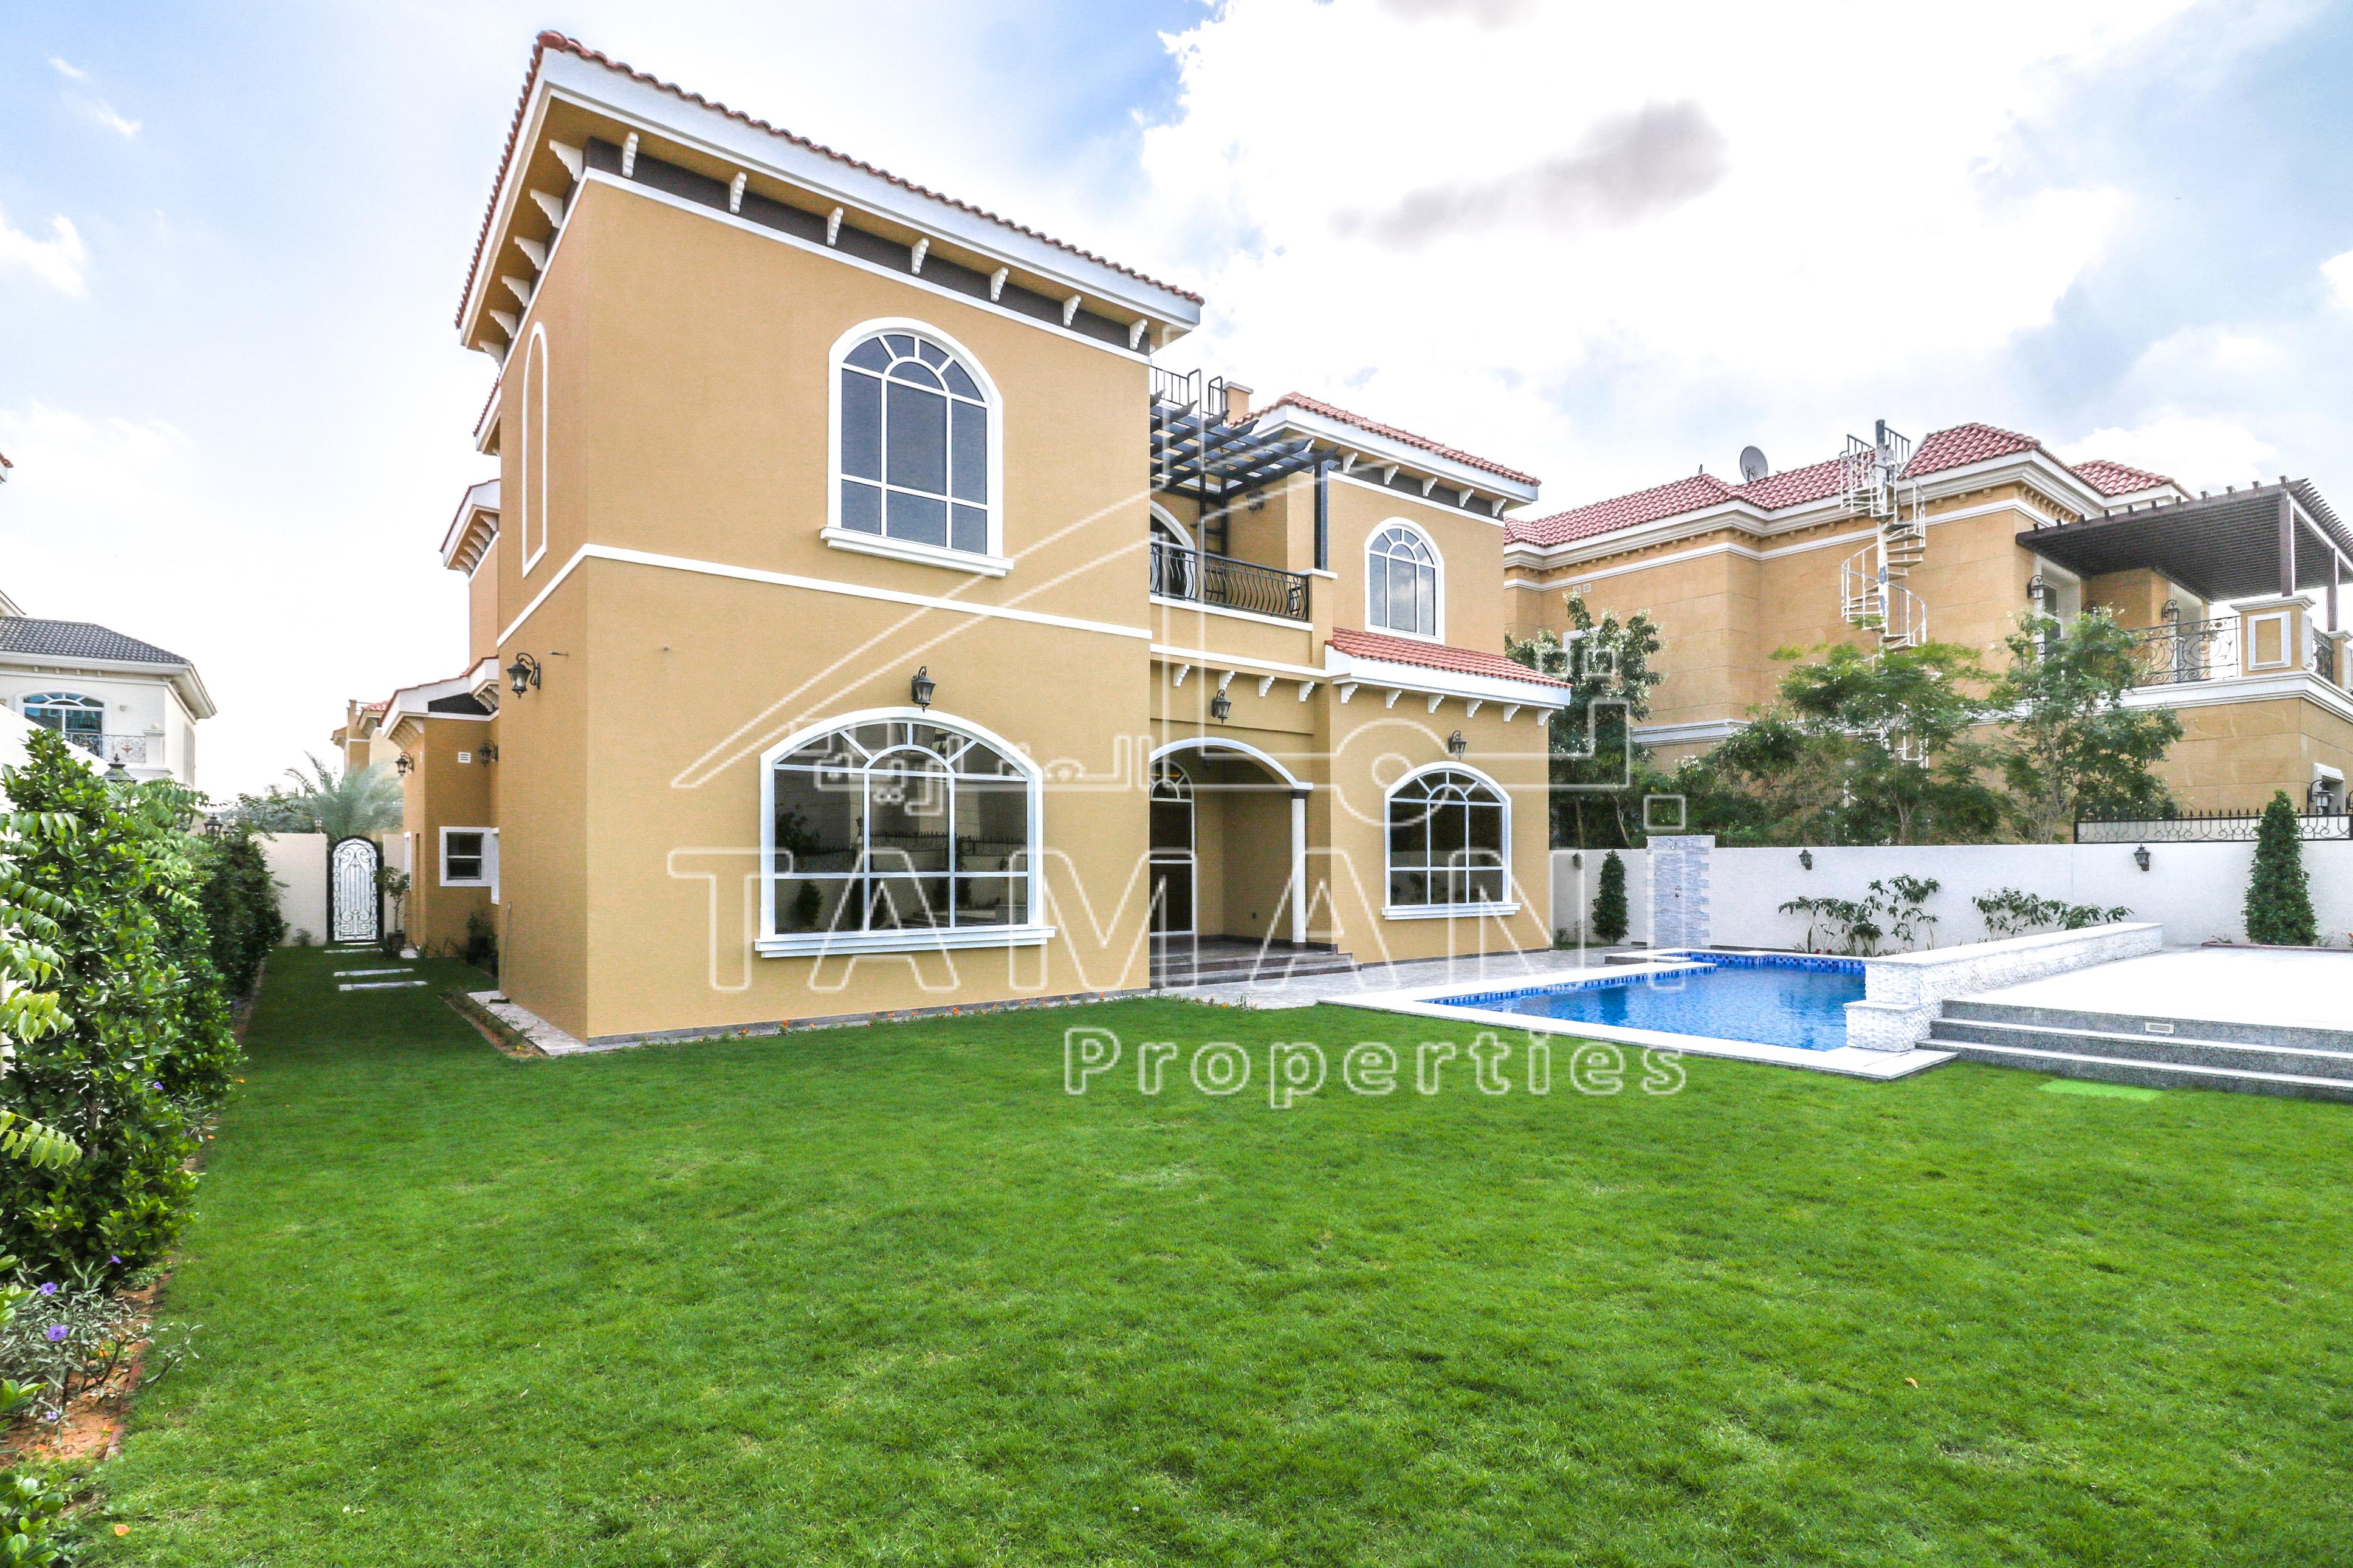 2 Brand New High Quality Villas Next to Each Other - Hacienda